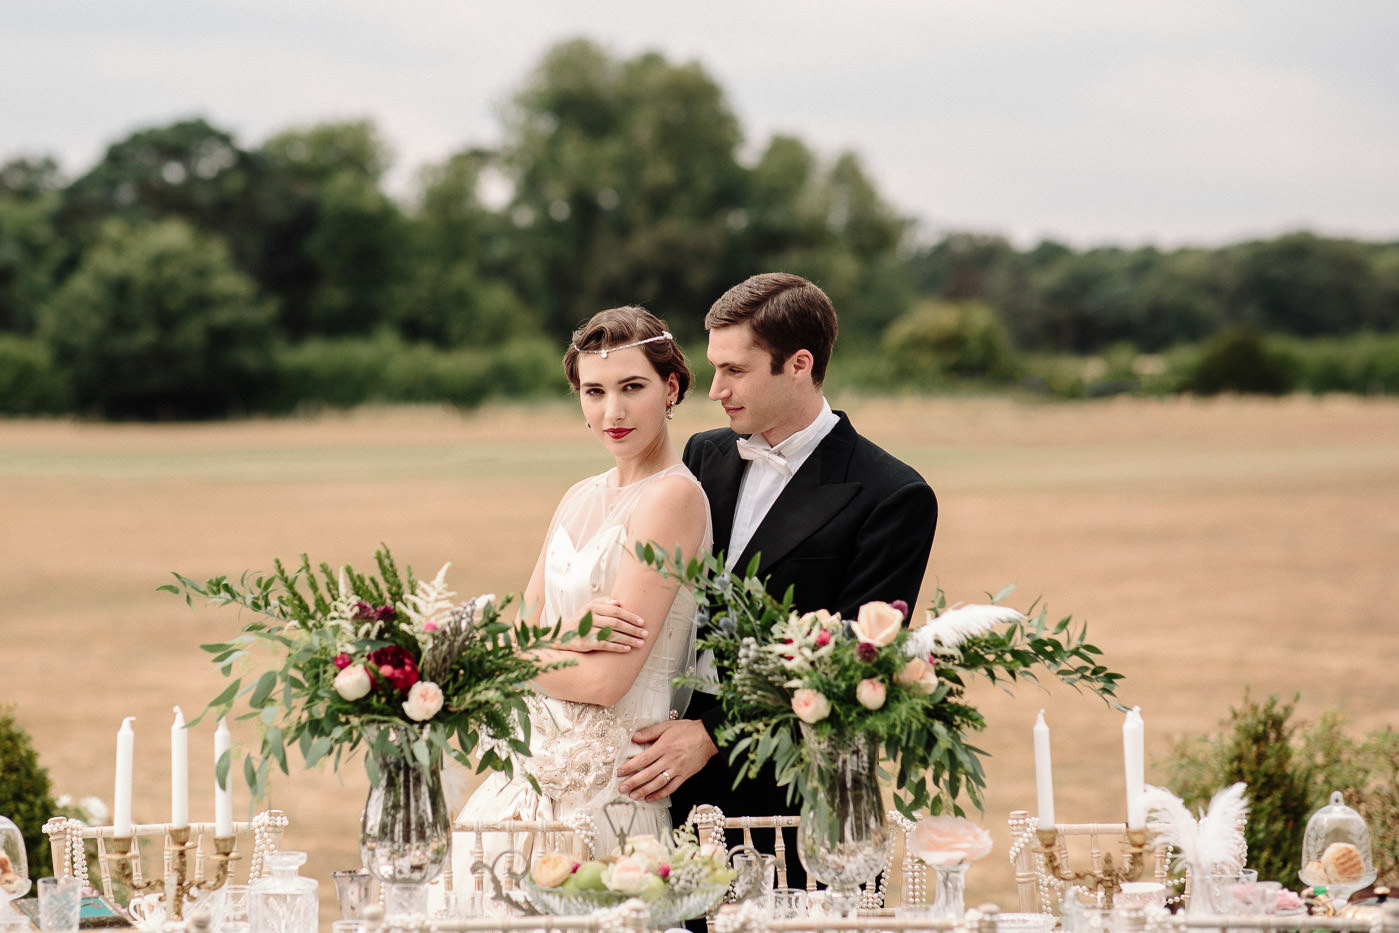 wedding-photographer-hertfordshire-50.jpg